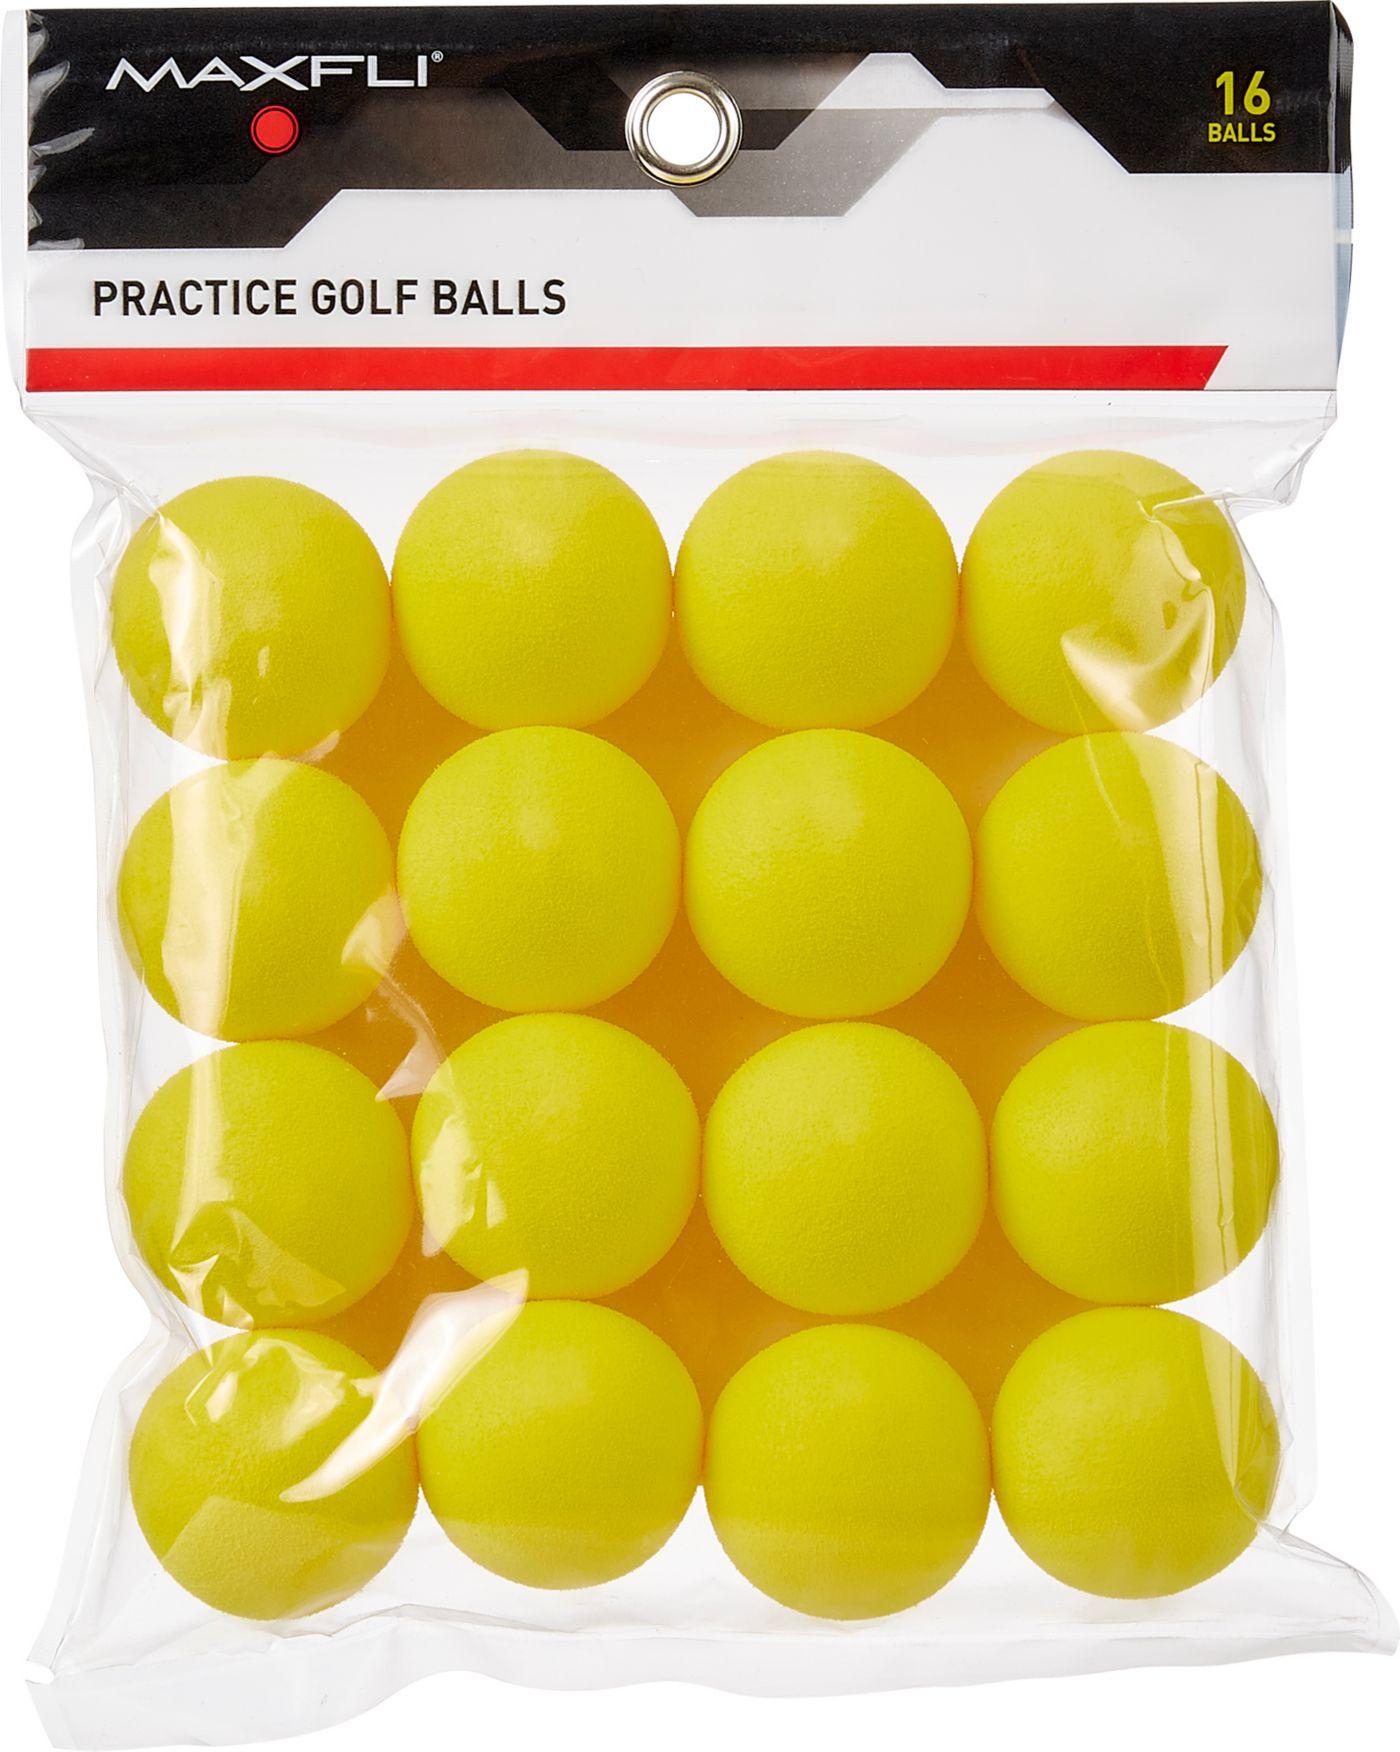 Maxfli Foam Practice Balls - 16-Pack